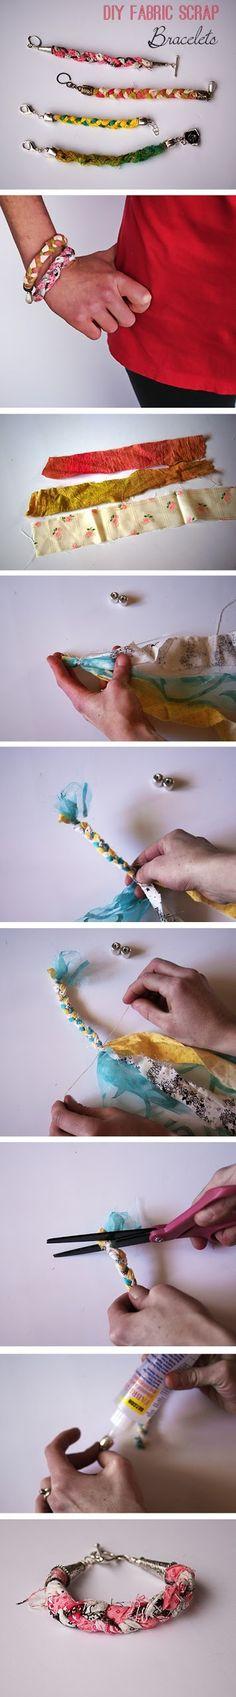 scrap fabric bracelets